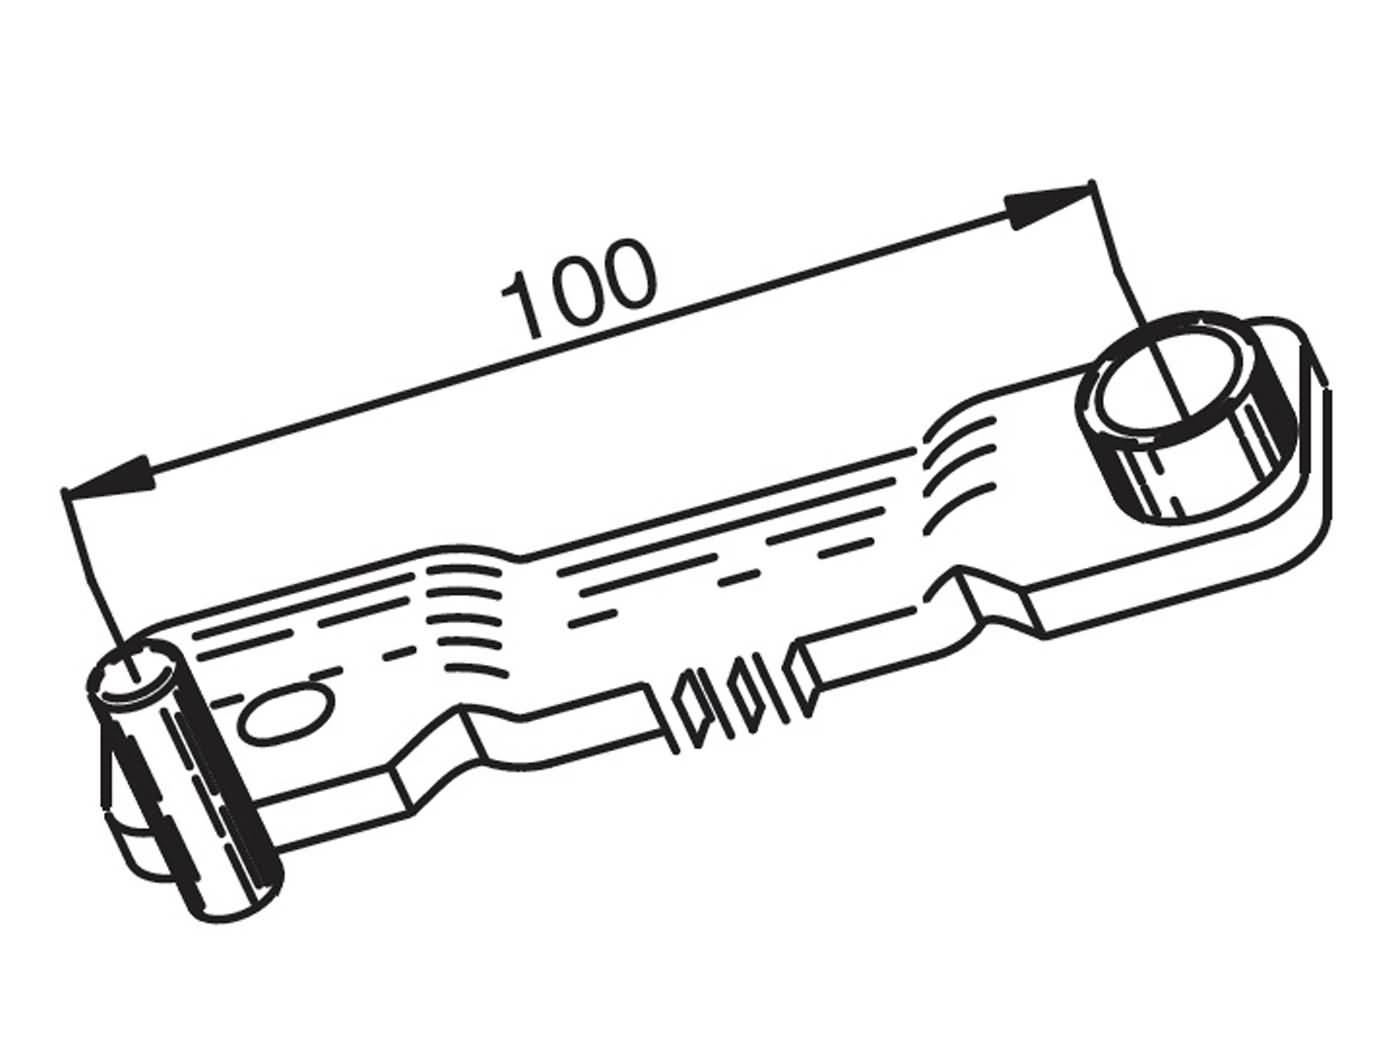 Variomatik Blockierwerkzeug 125-150cc Piaggio 4T